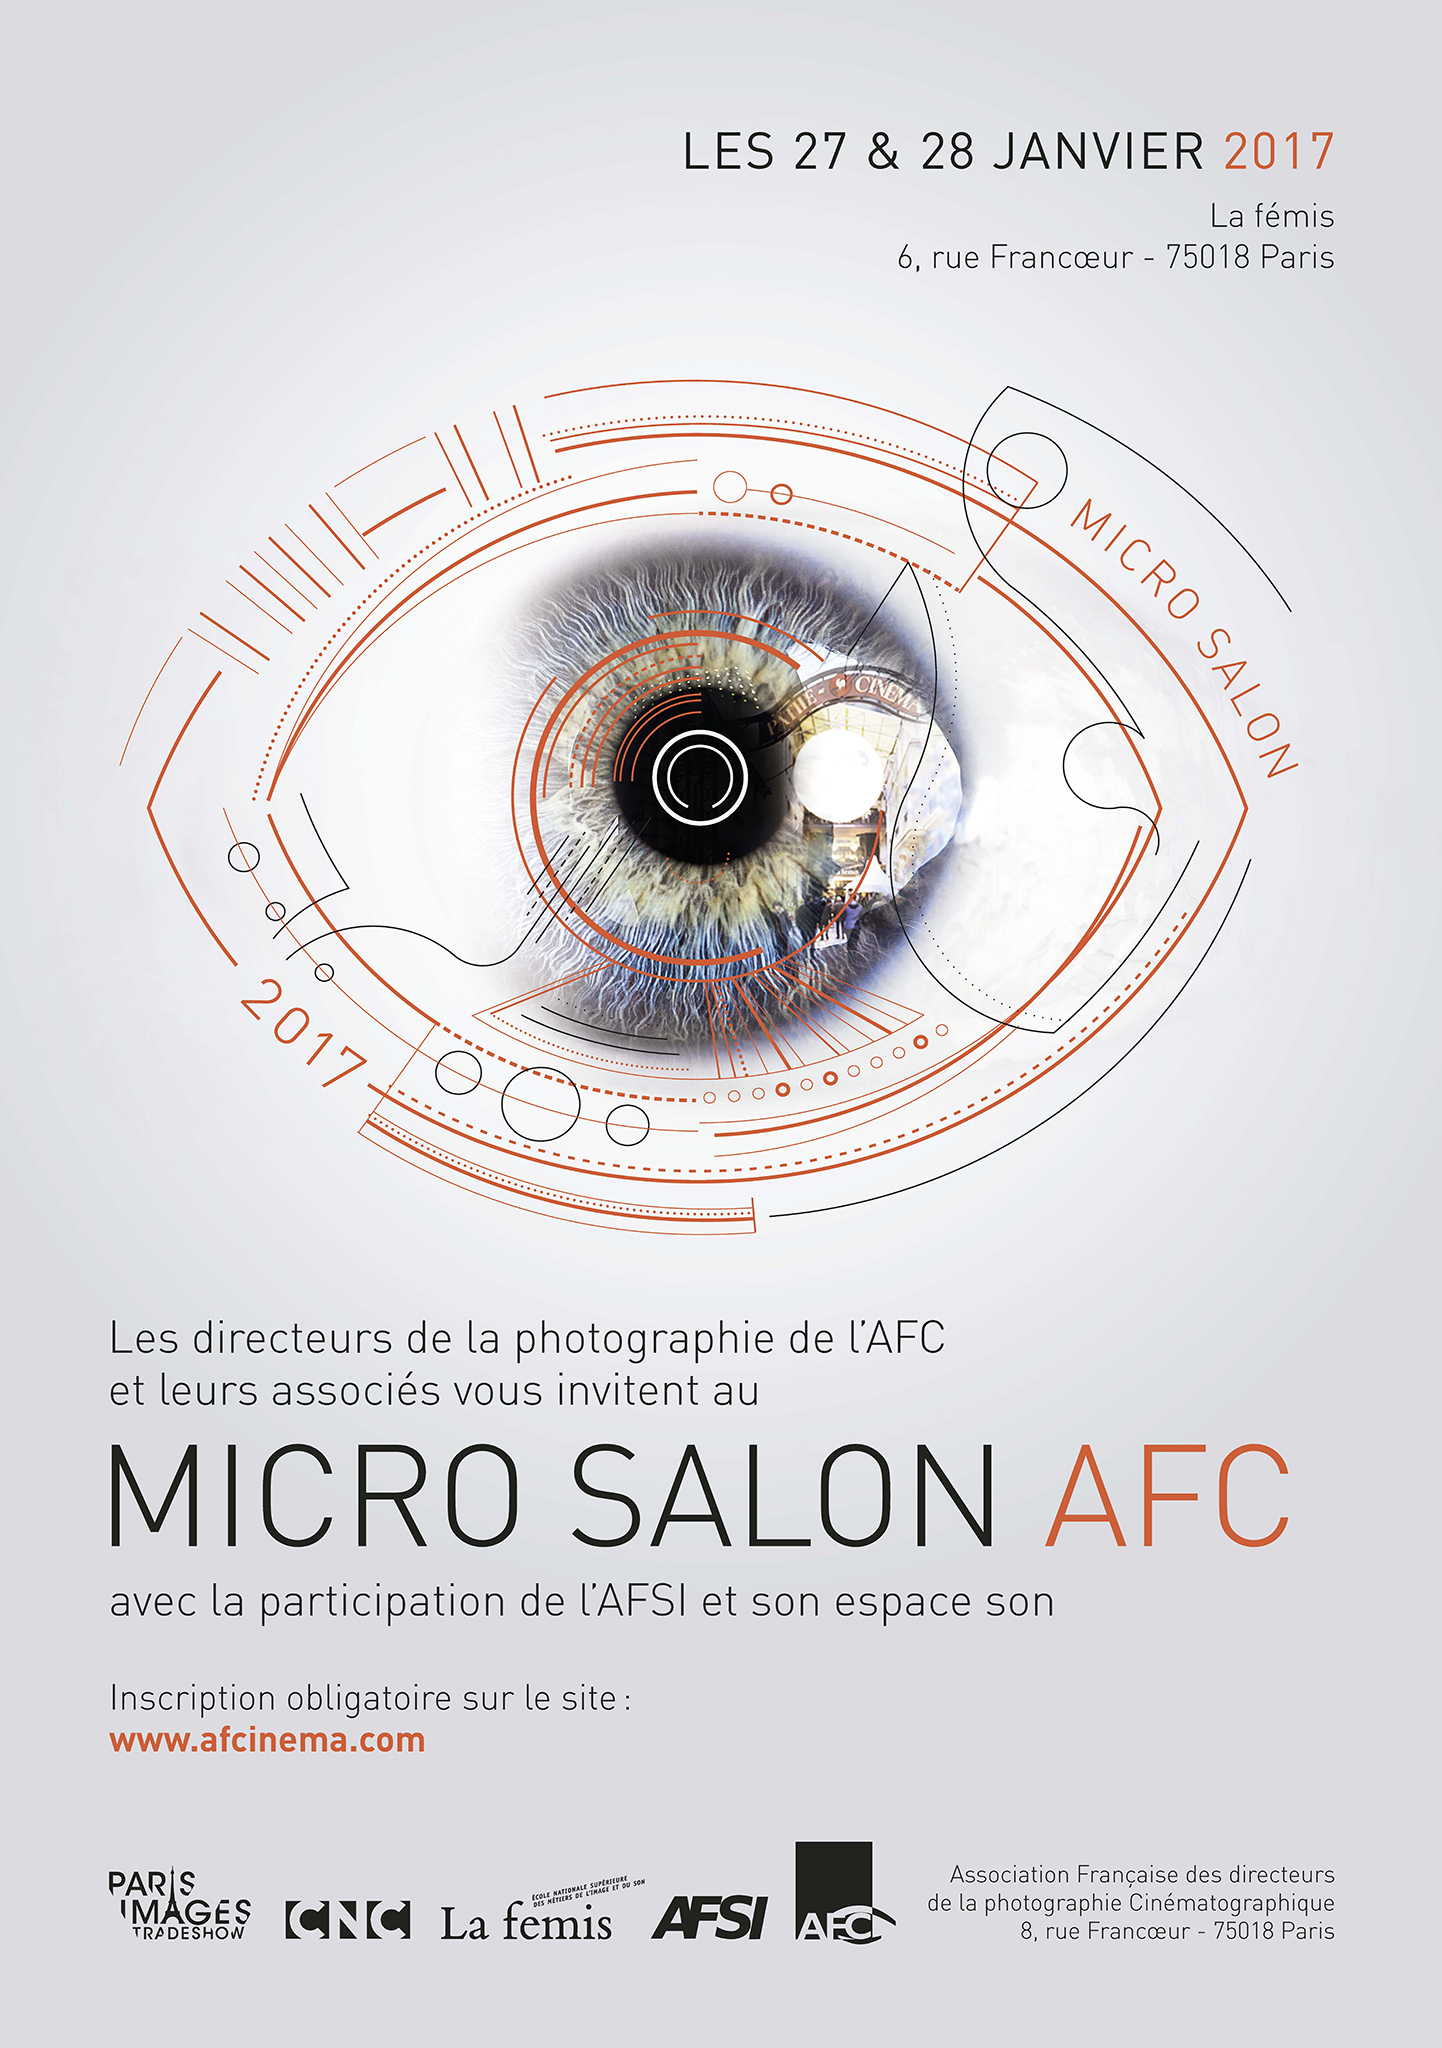 bebob auf dem Micro Salon AFC Paris